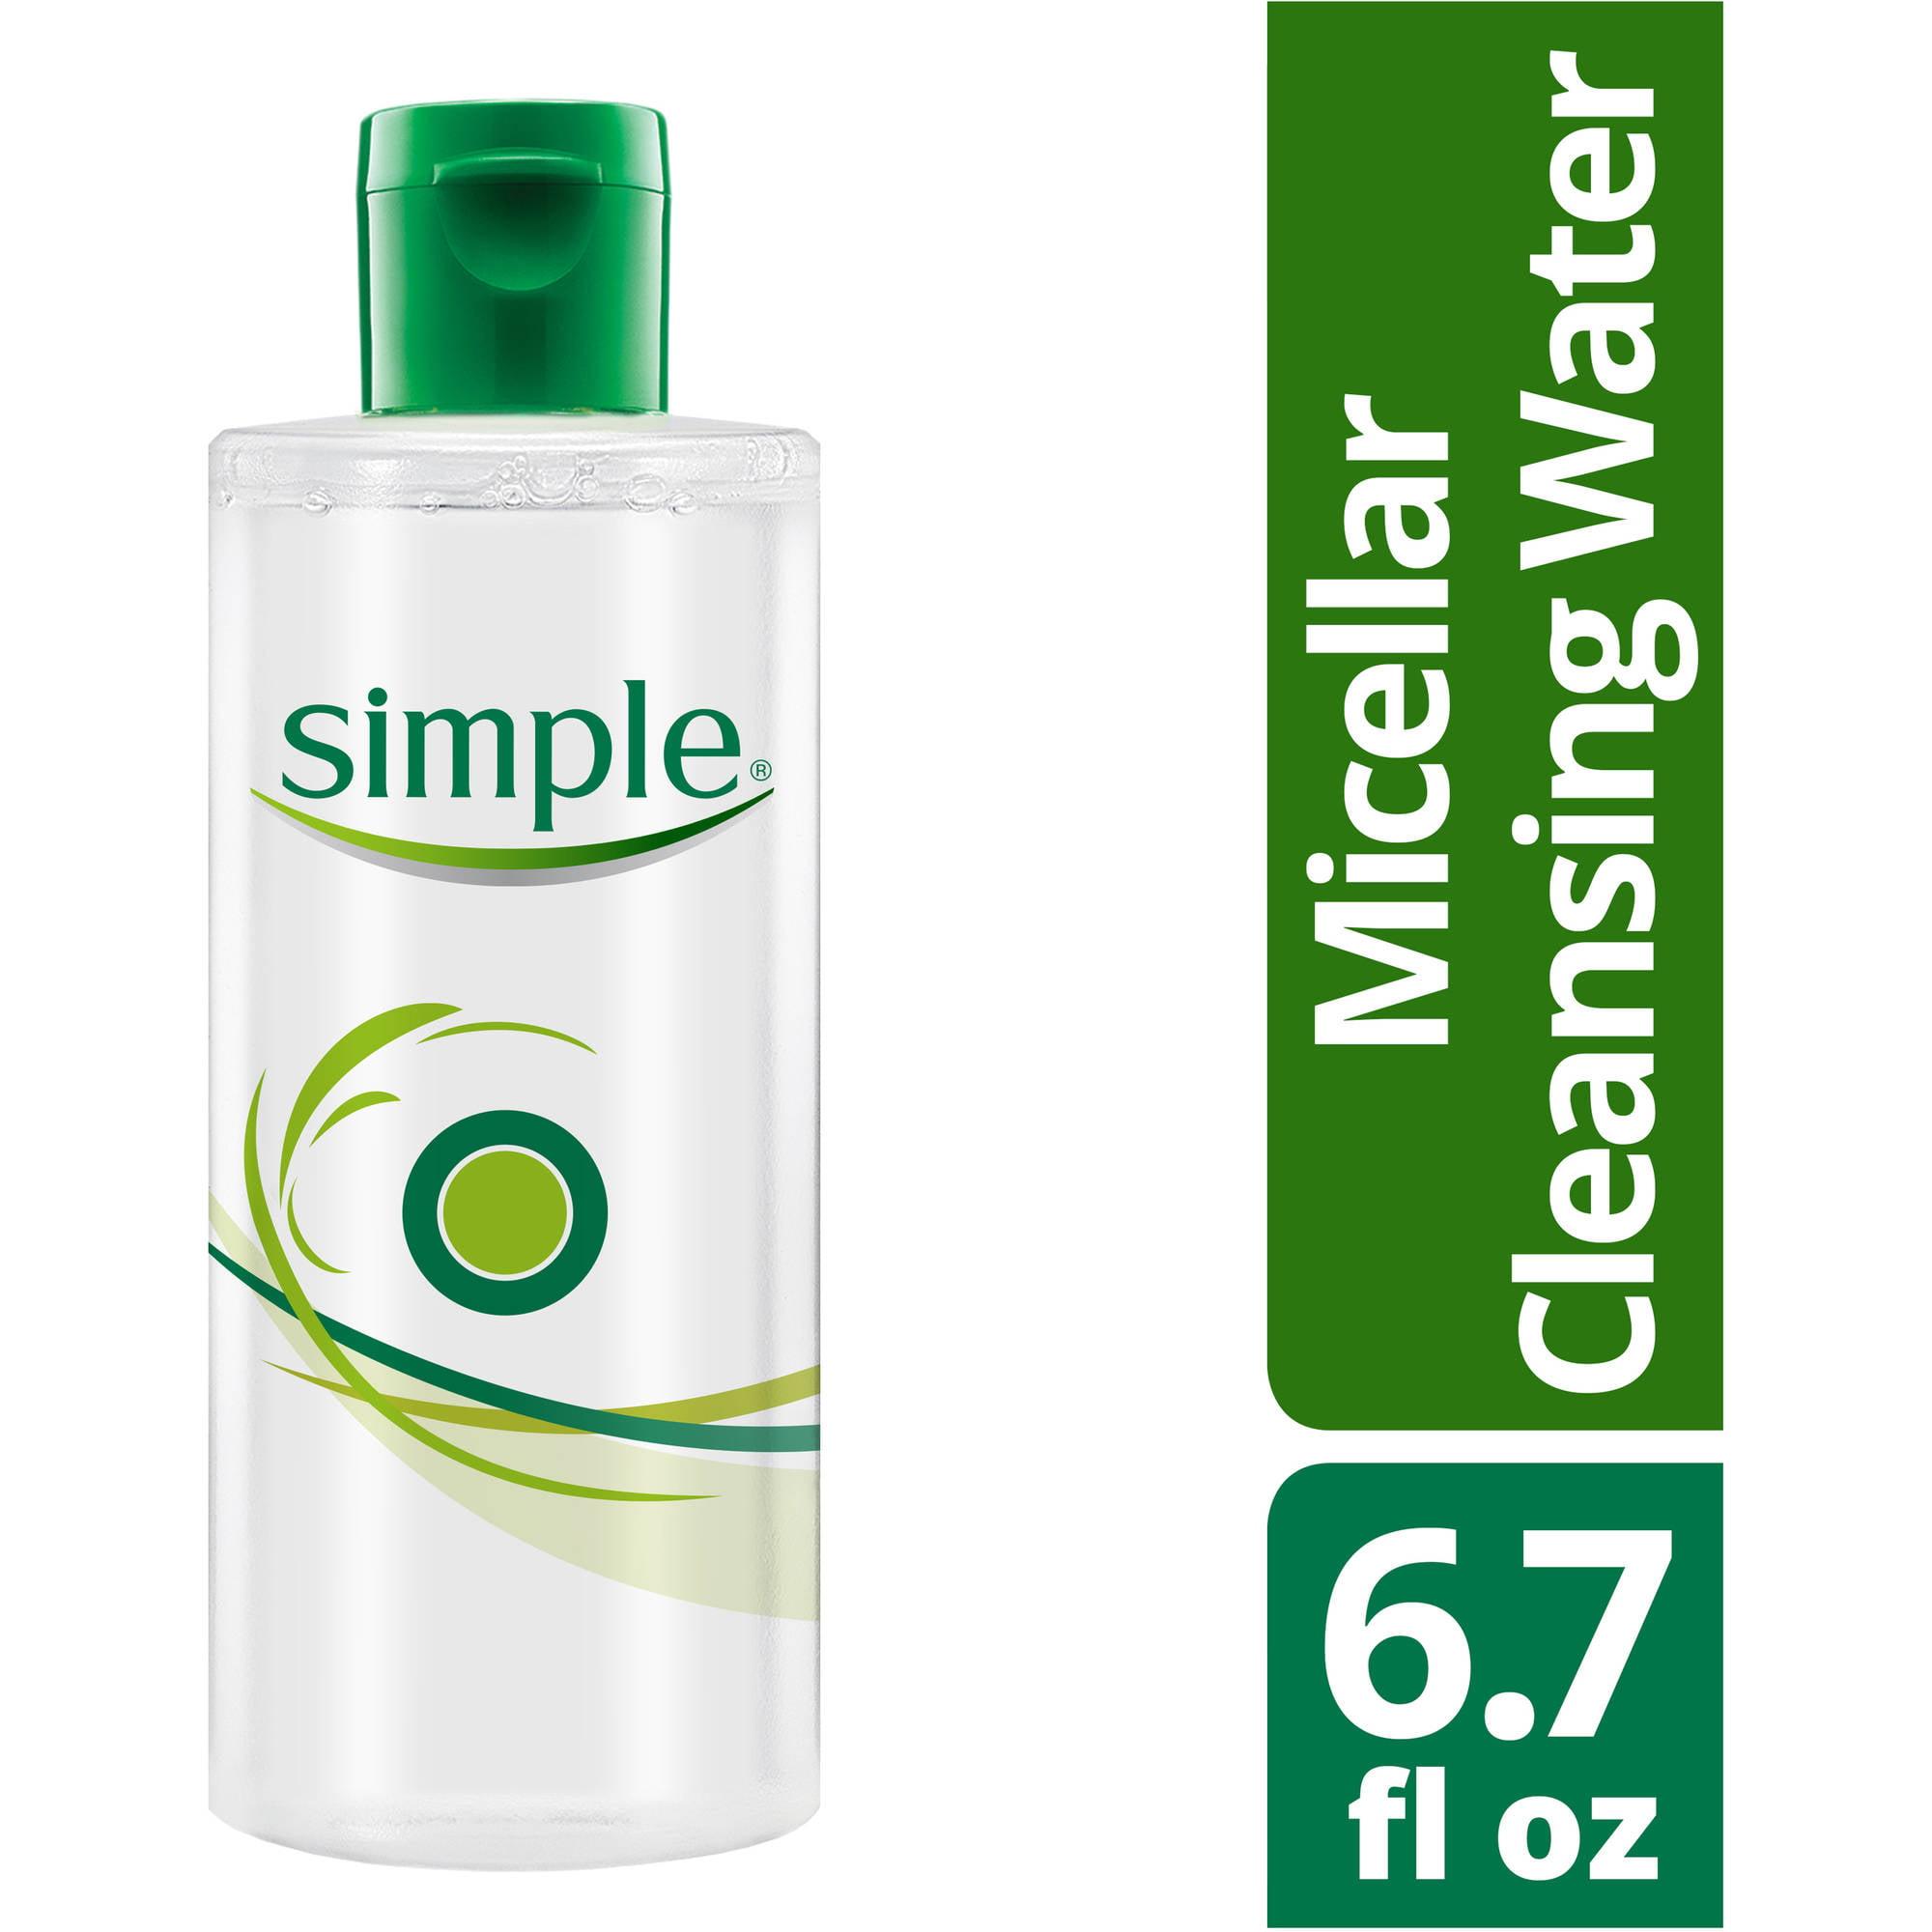 Simple Micellar Cleansing Water, 6.7 oz